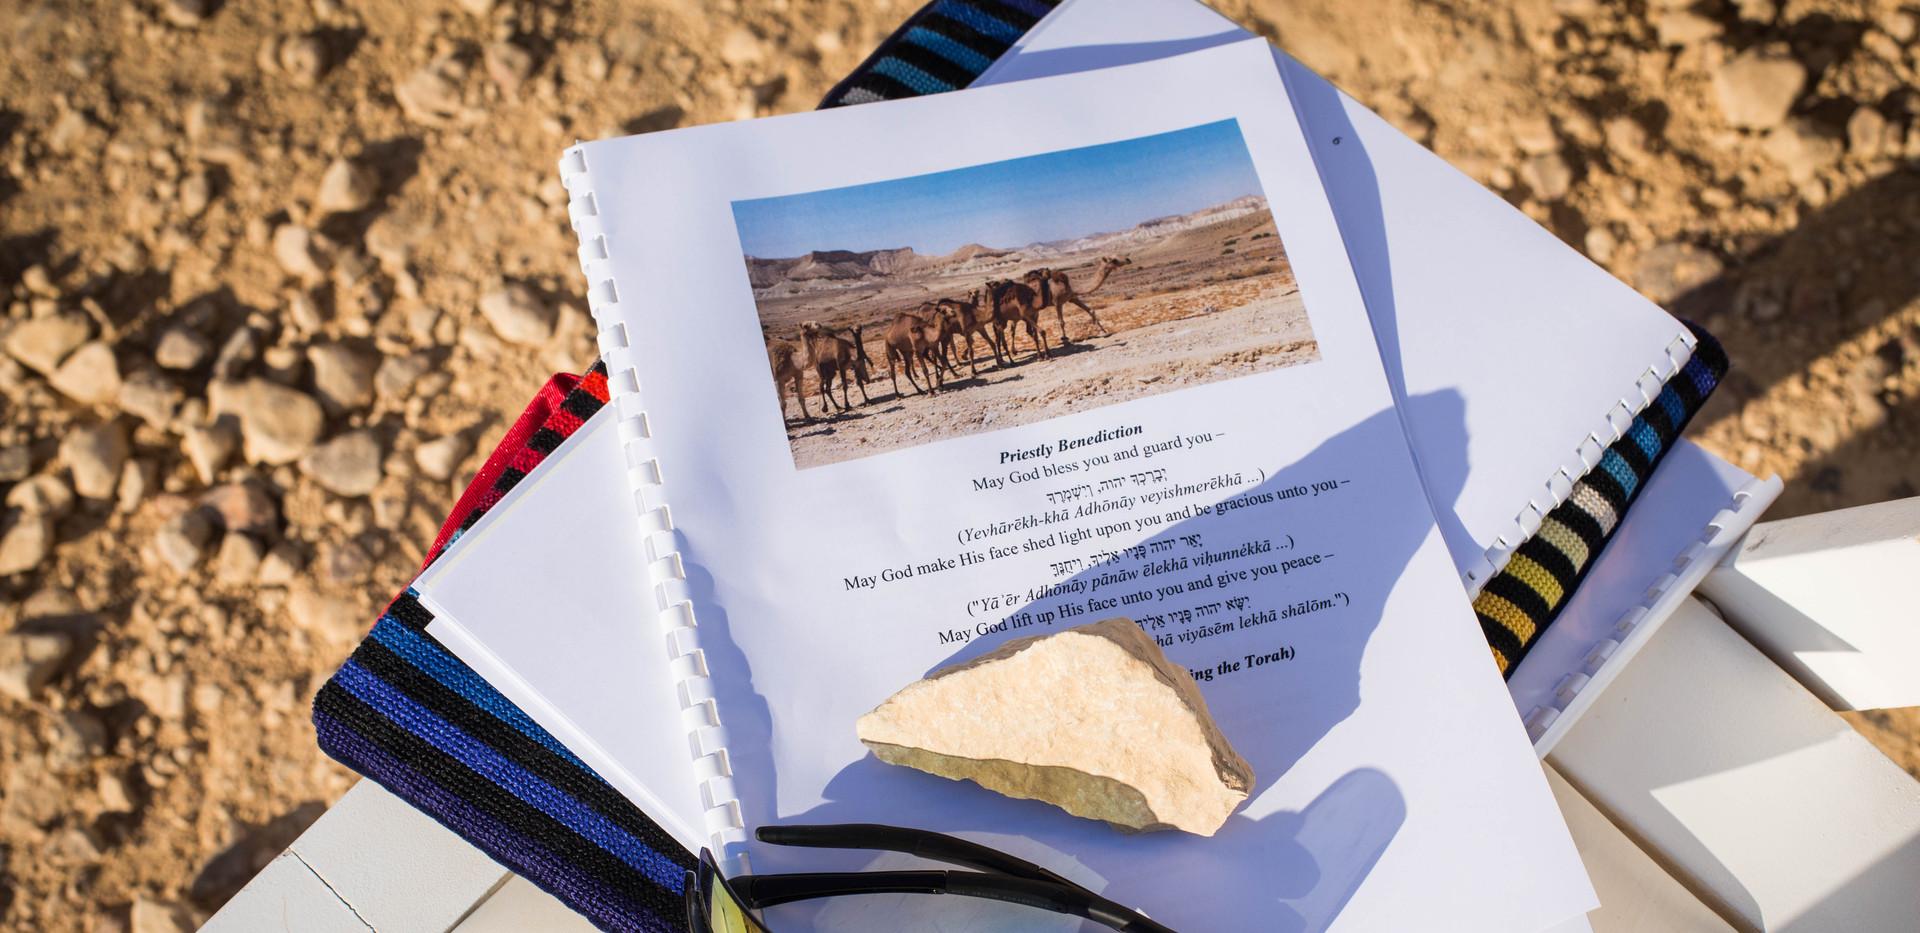 Specialy prepared Bar Mitzvah folder